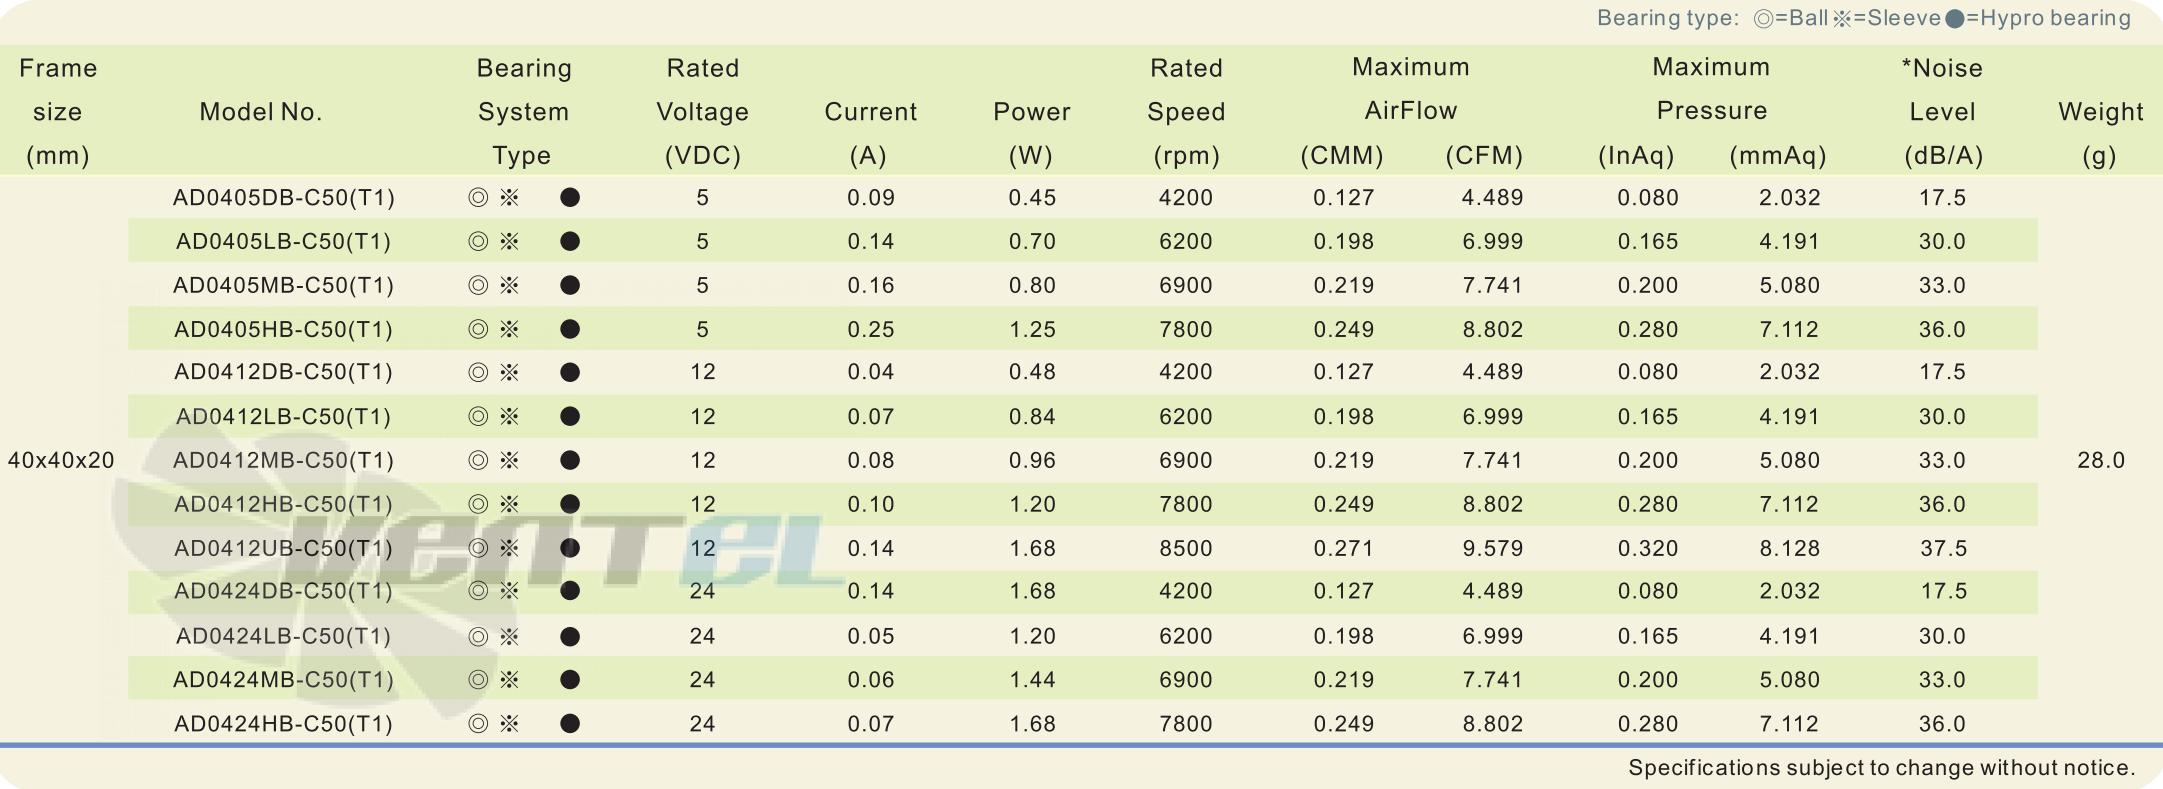 Рабочие параметры и характеристики ADDA AD0405DB-C50 40x40x20 DC